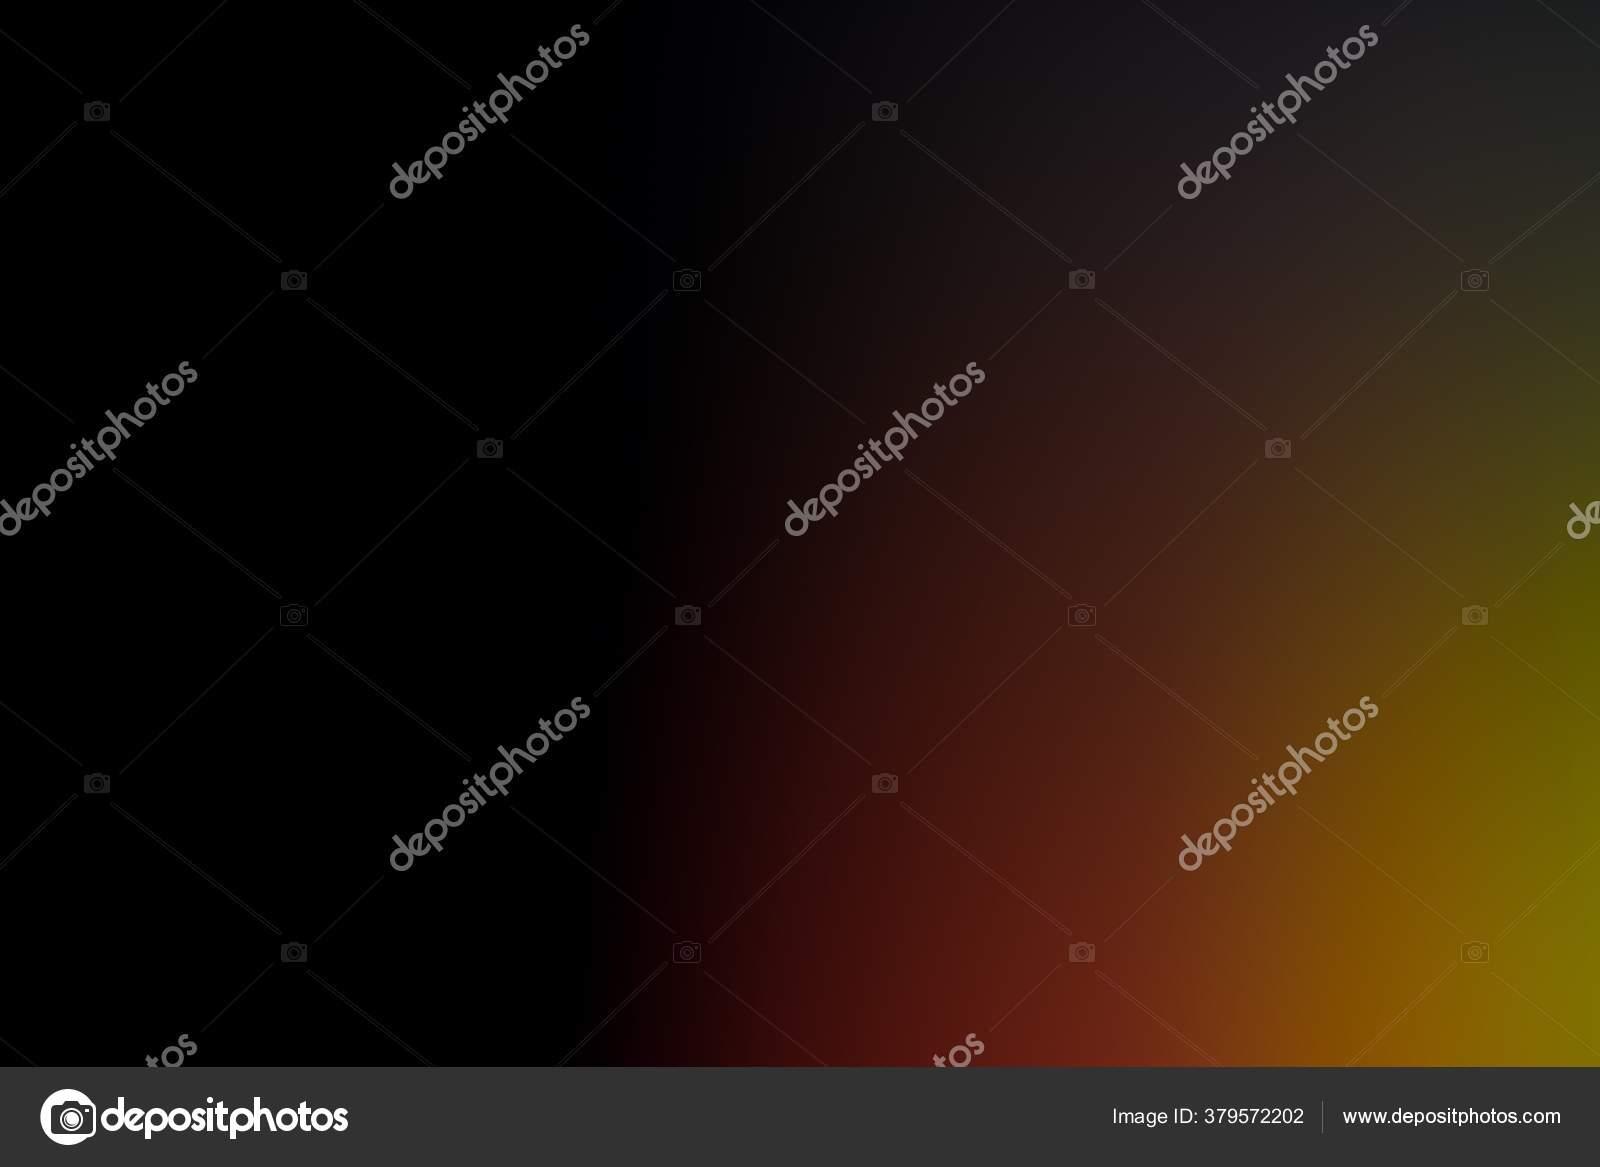 depositphotos 379572202 stock photo dark wallpaper red yellow light